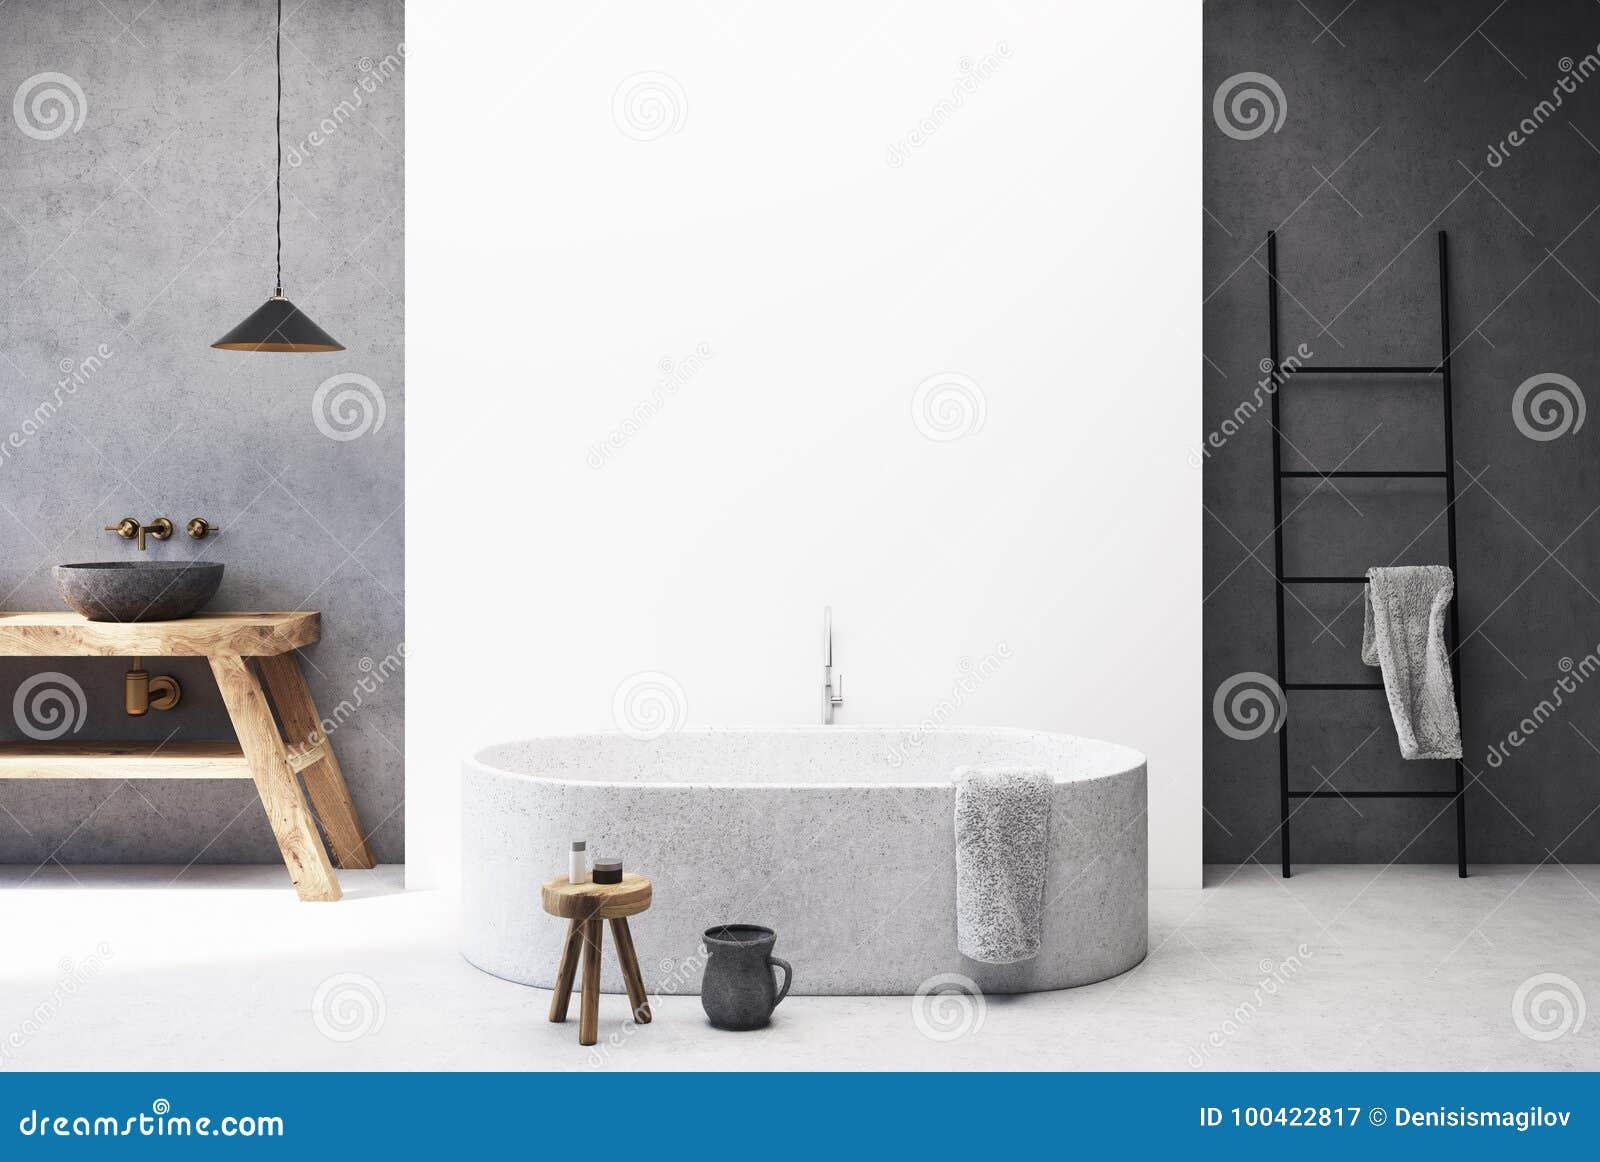 Конкретная и белая ванная комната, круглый ушат